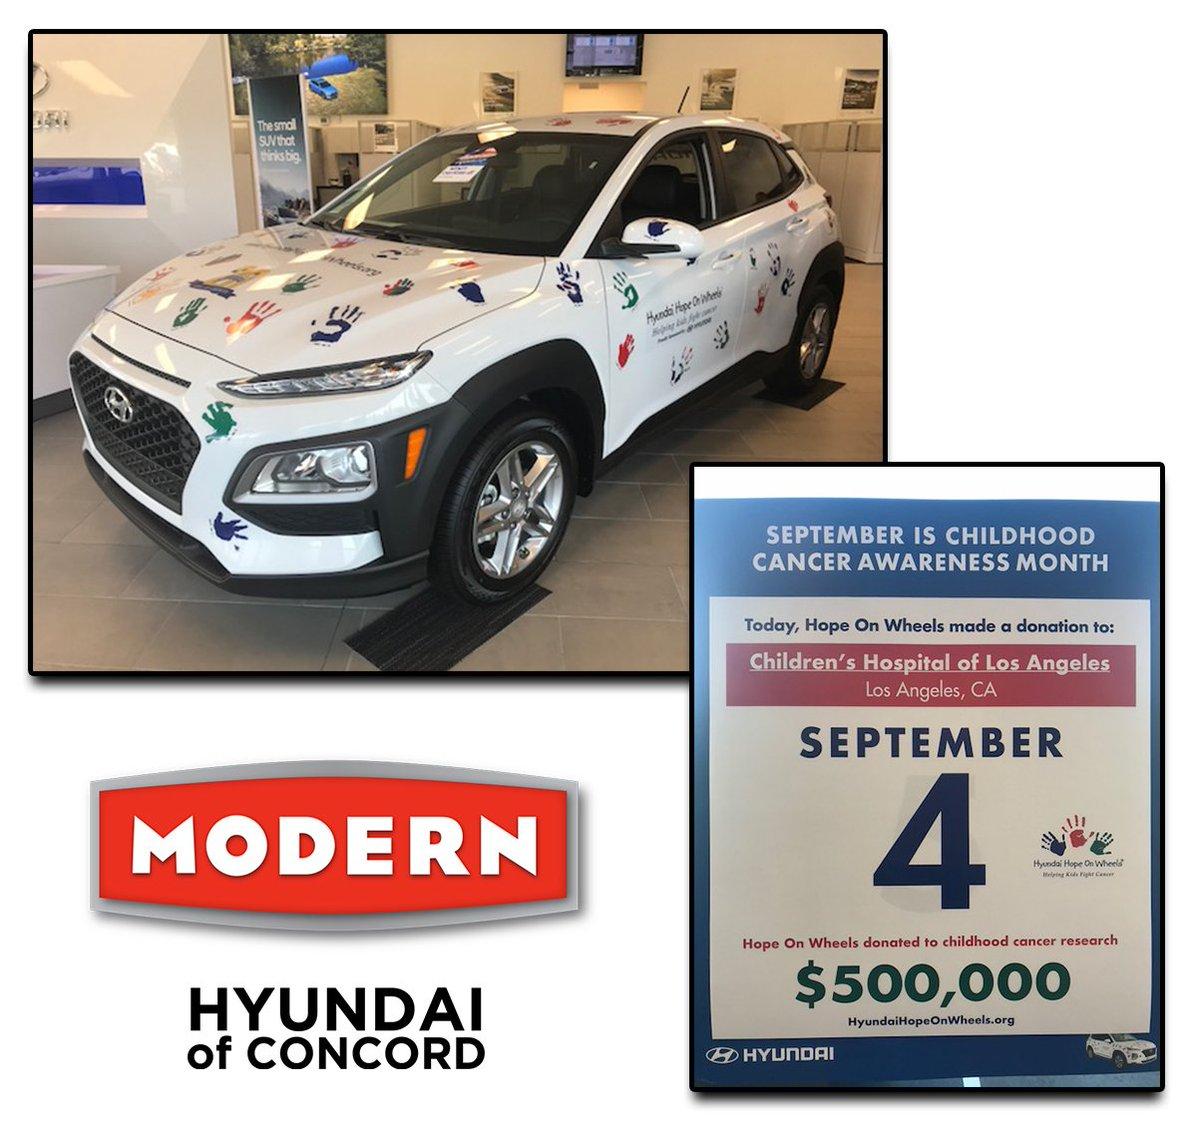 Hyundai Hope On Wheels Is In Full Effect At Modern Hyundai!! Hyundai Makes  A Difference!! #modernauto #modernmakesadifference #hyundai #concordnc # Concord ...